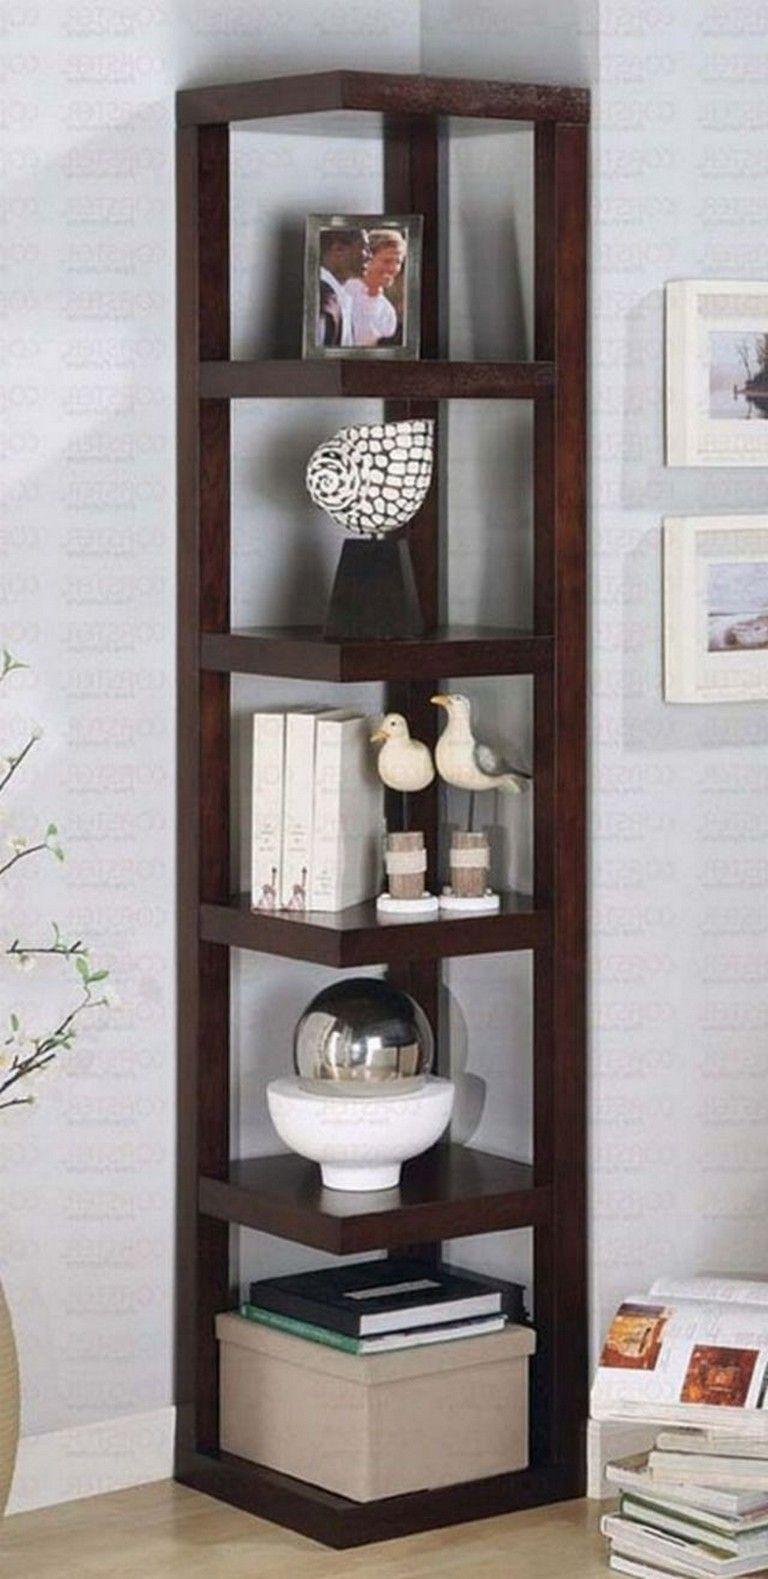 20 Amazing Corner Shelves Design Ideas For Your Living Room Living Room Corner Decor Apartment Furniture Layout Corner Furniture Corner cabinets for living rooms